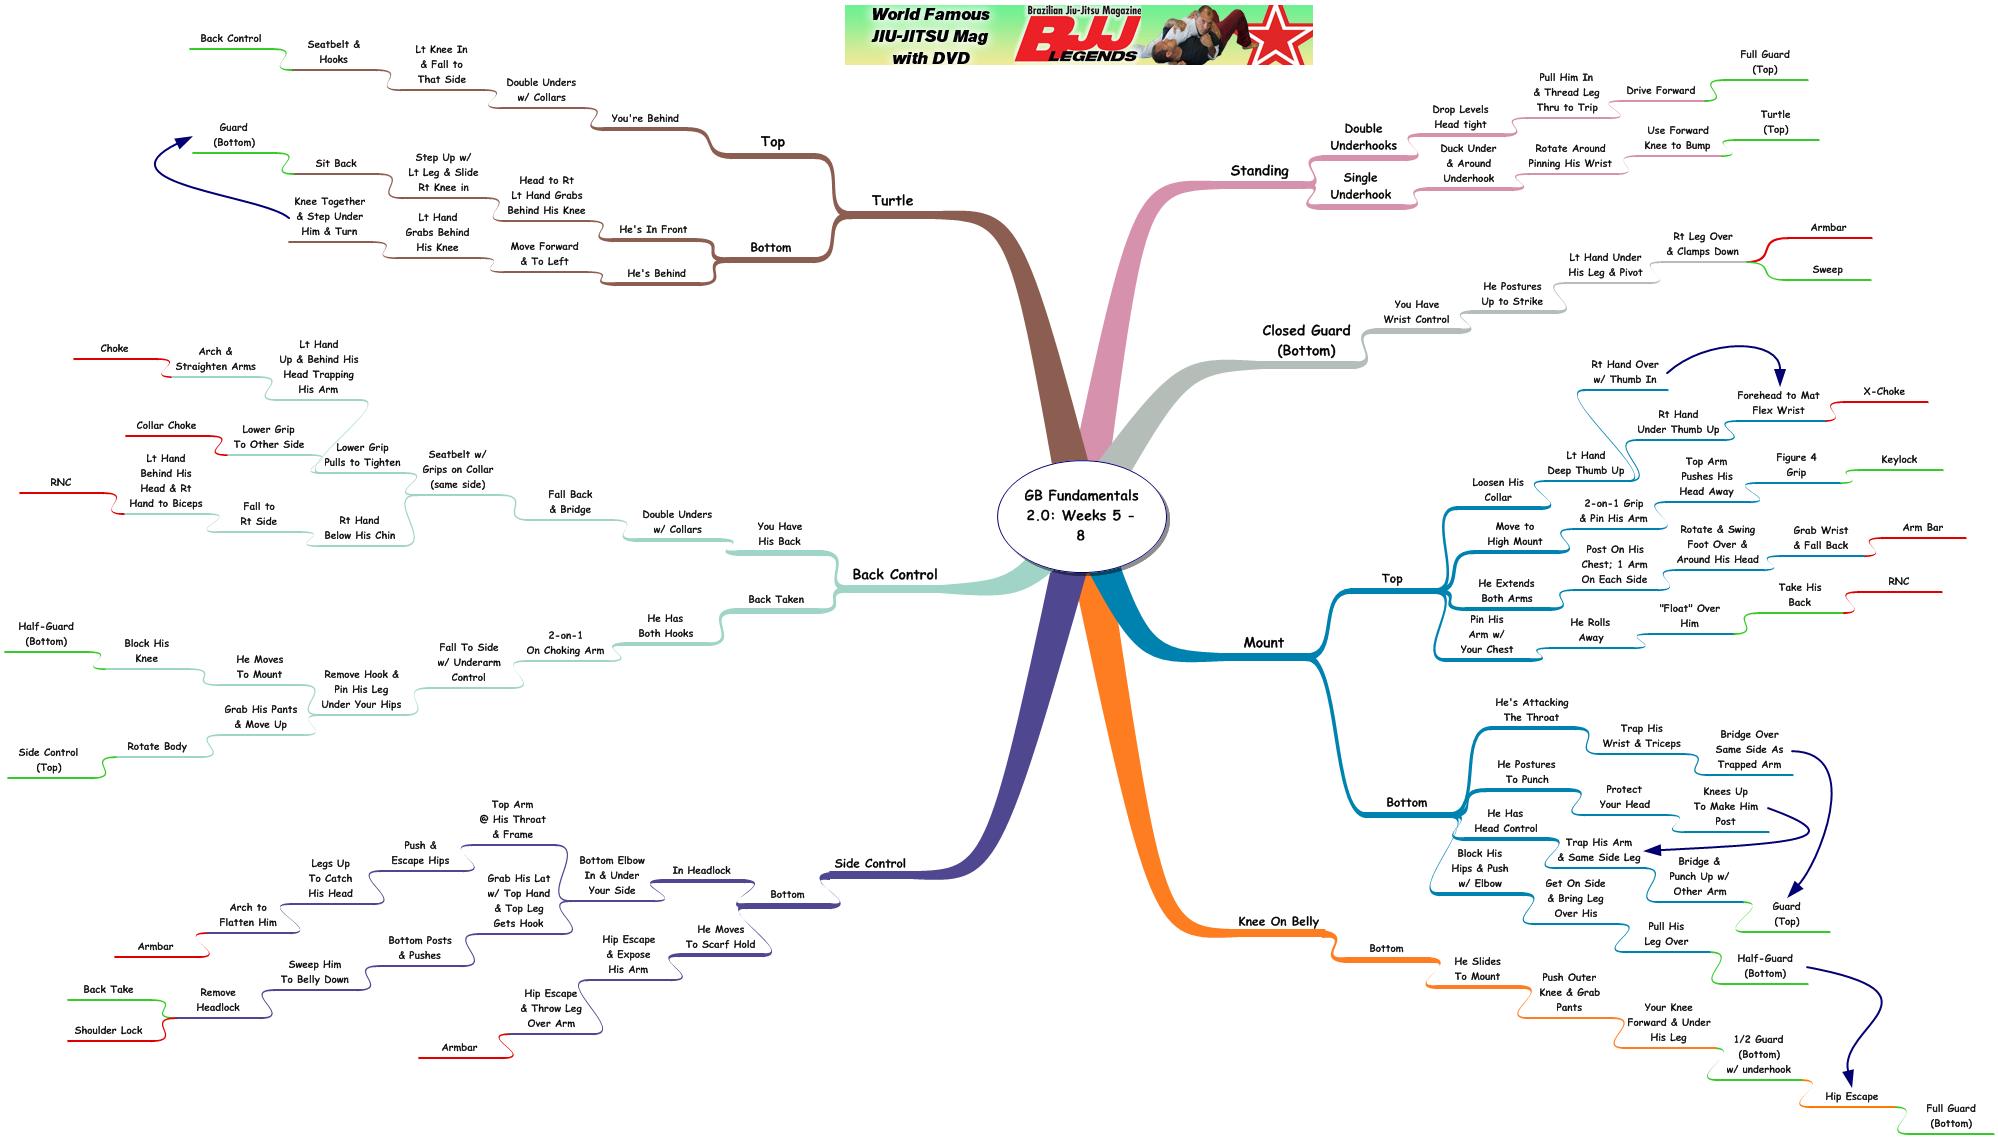 Review/Mindmap: Gracie Barra Fundamentals 2.0 App Weeks 5 thru 8